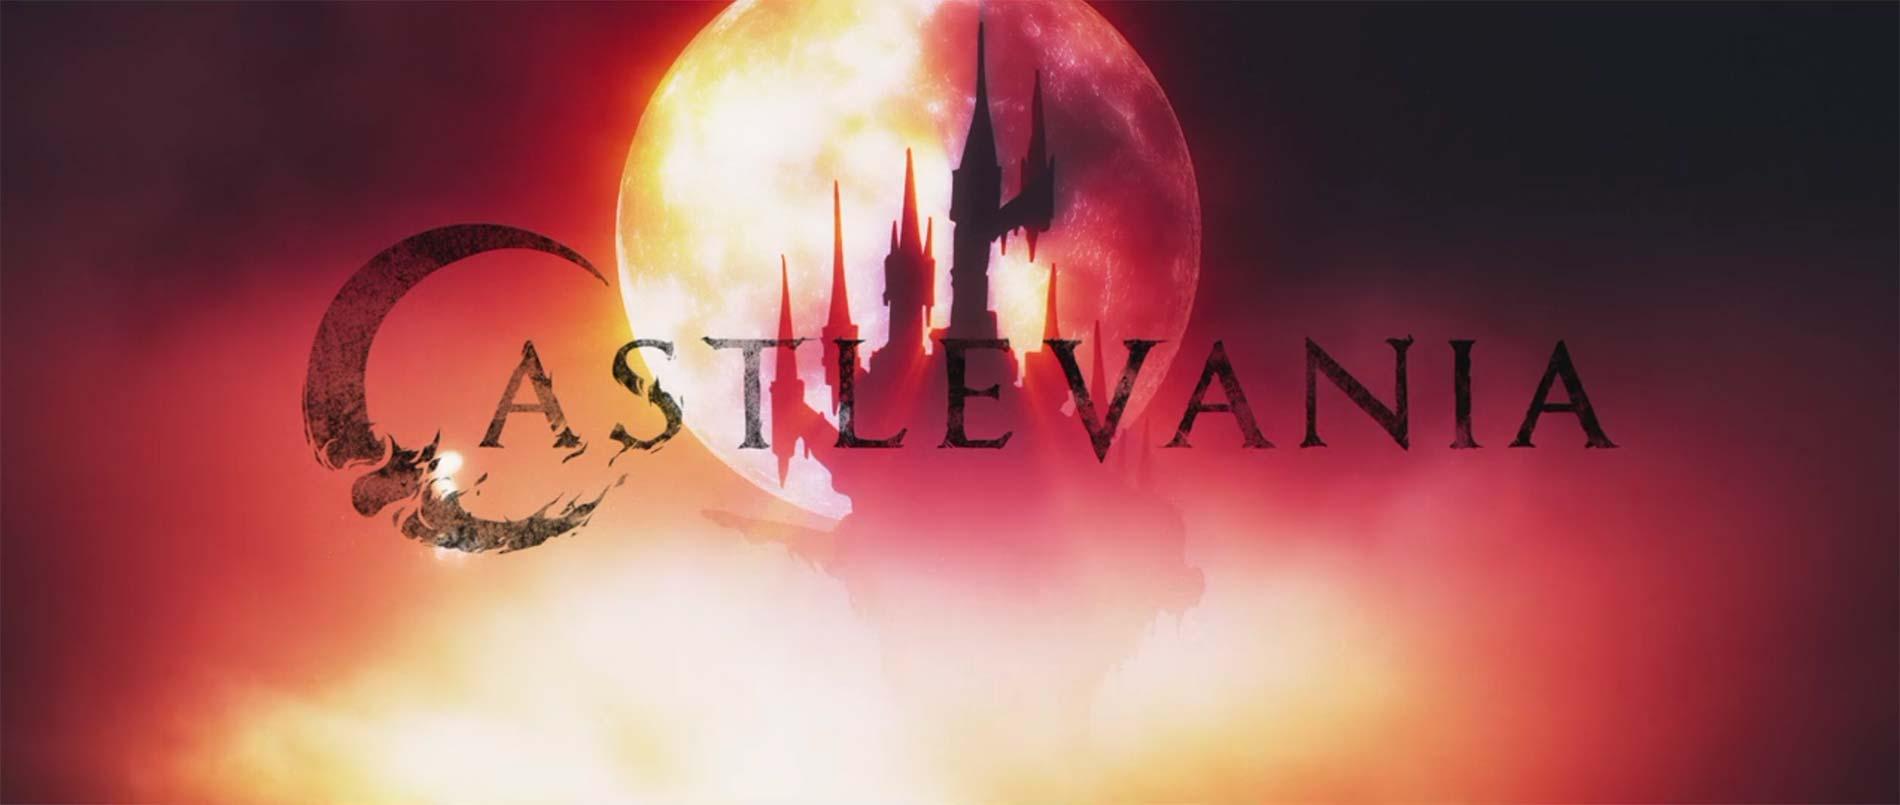 castlevania-opening2